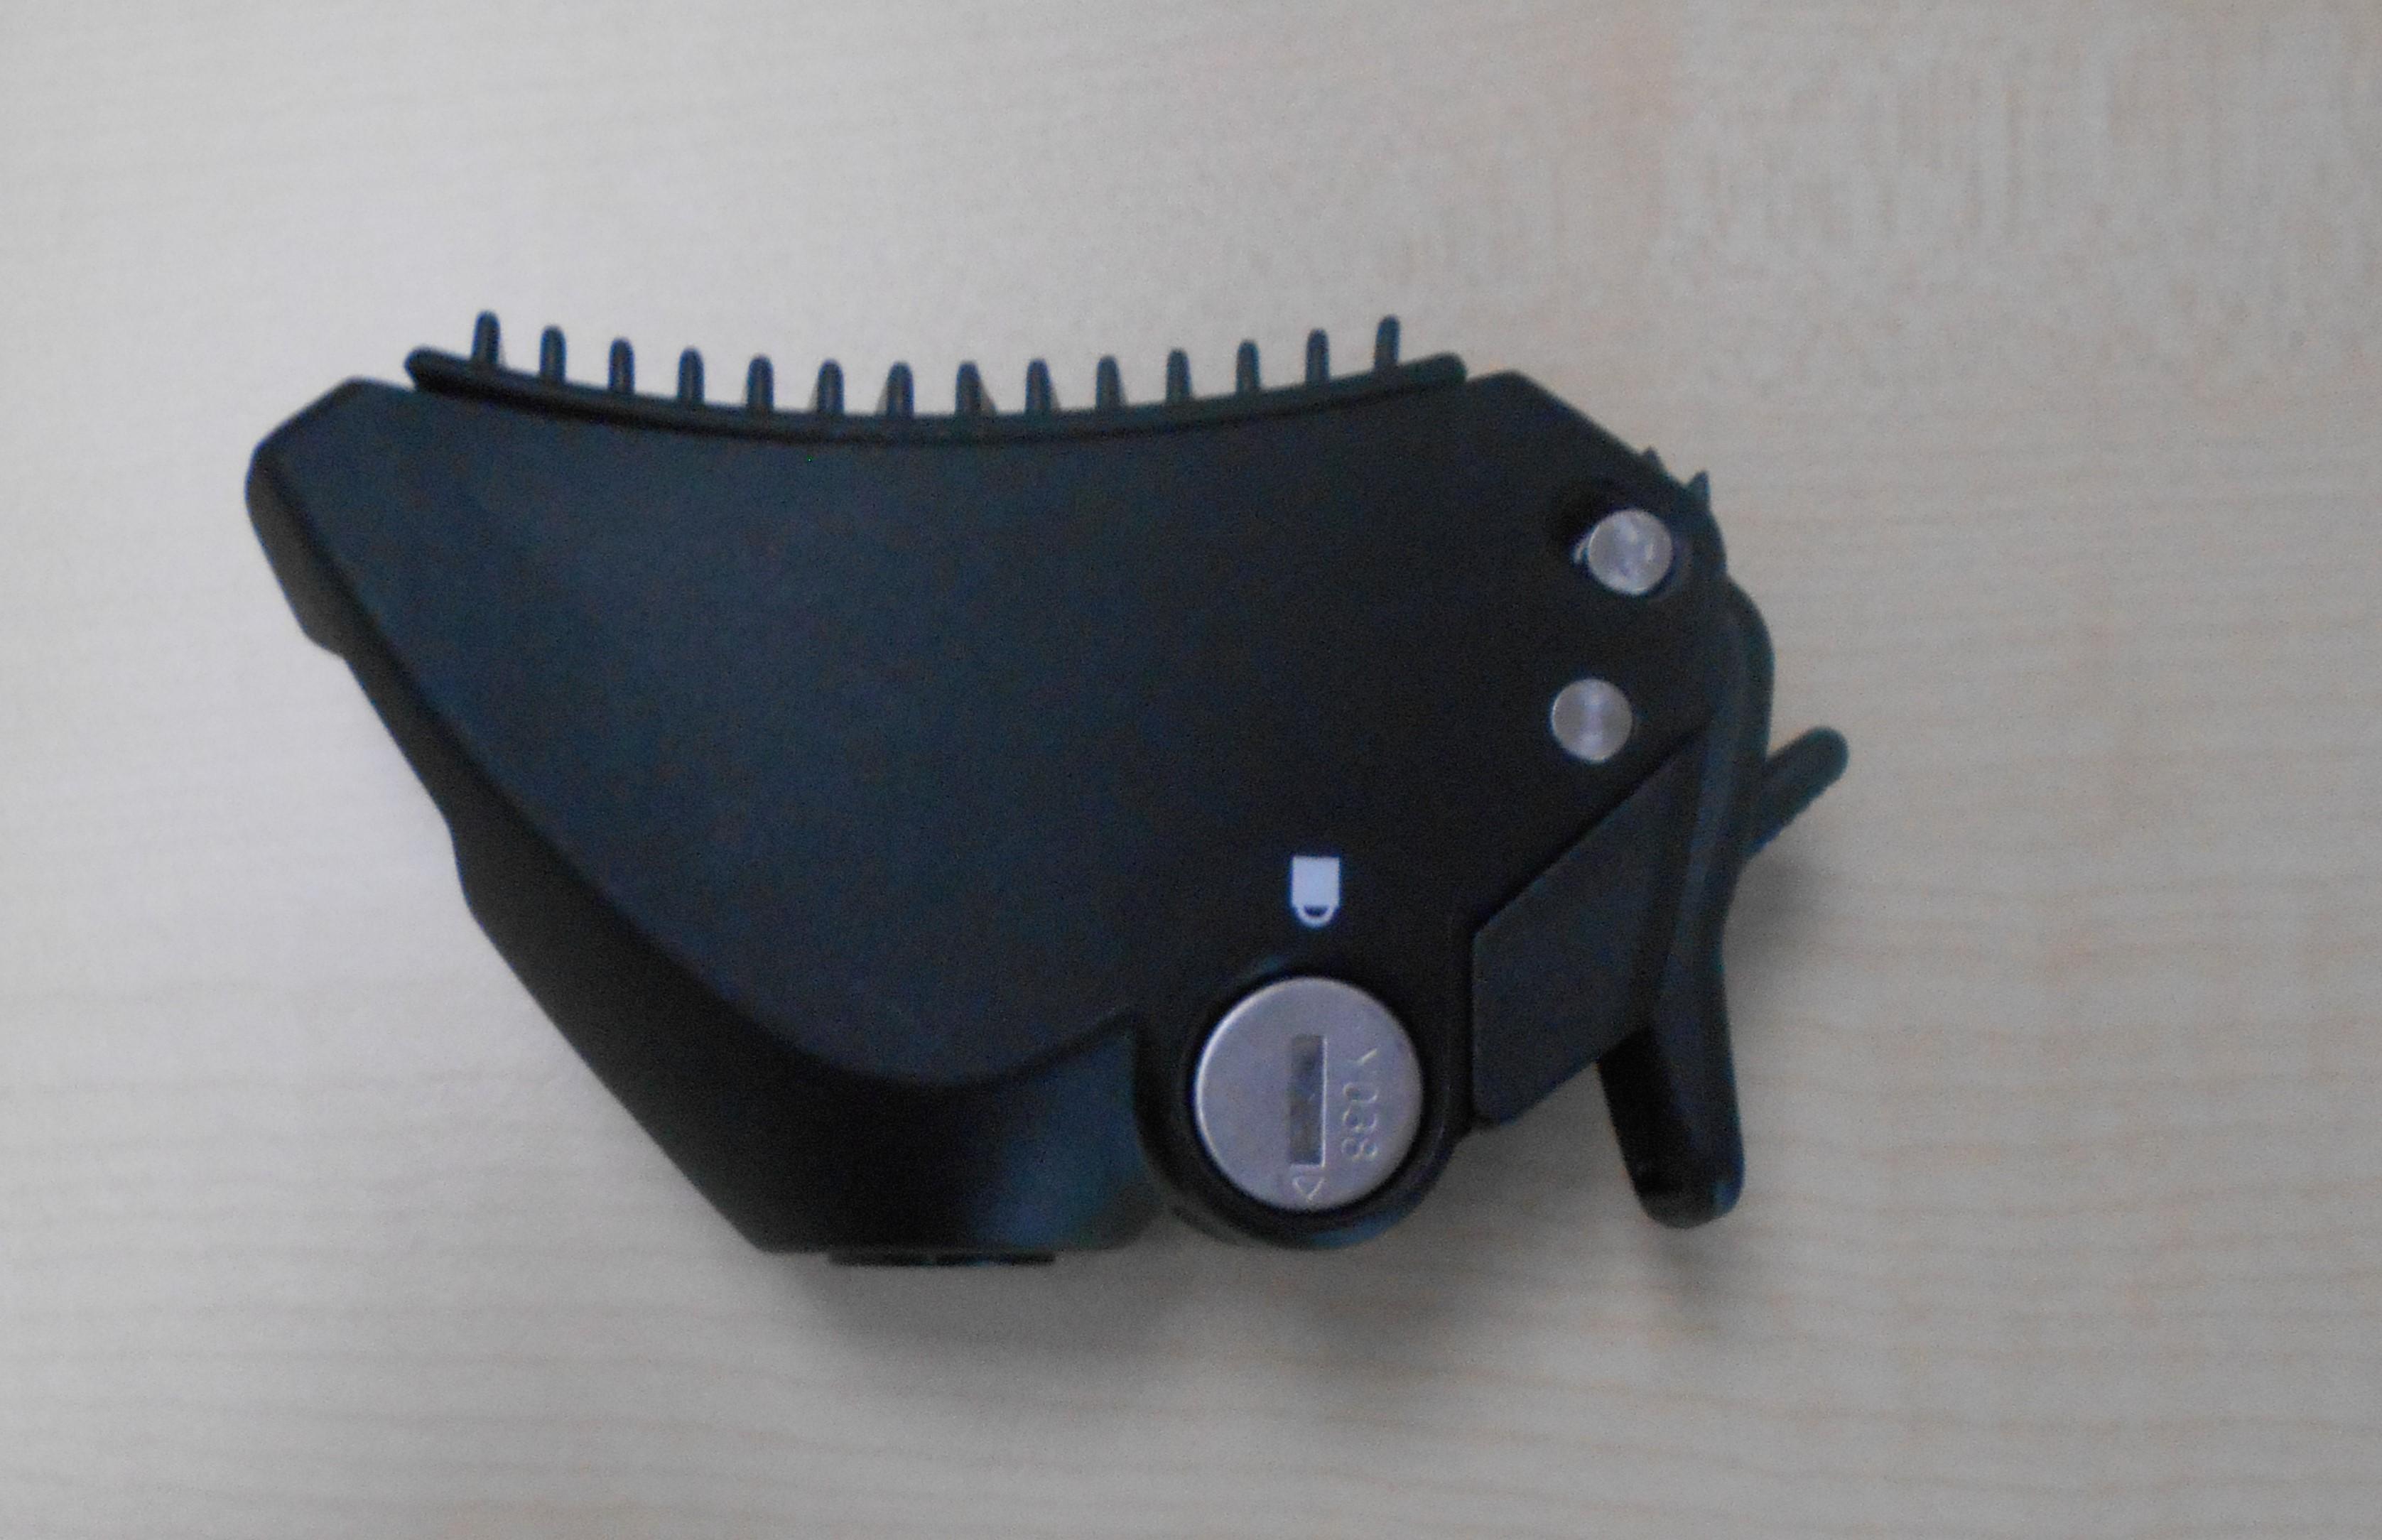 Kopf E-Bike Rahmenhalter mit Schlosscode Y014